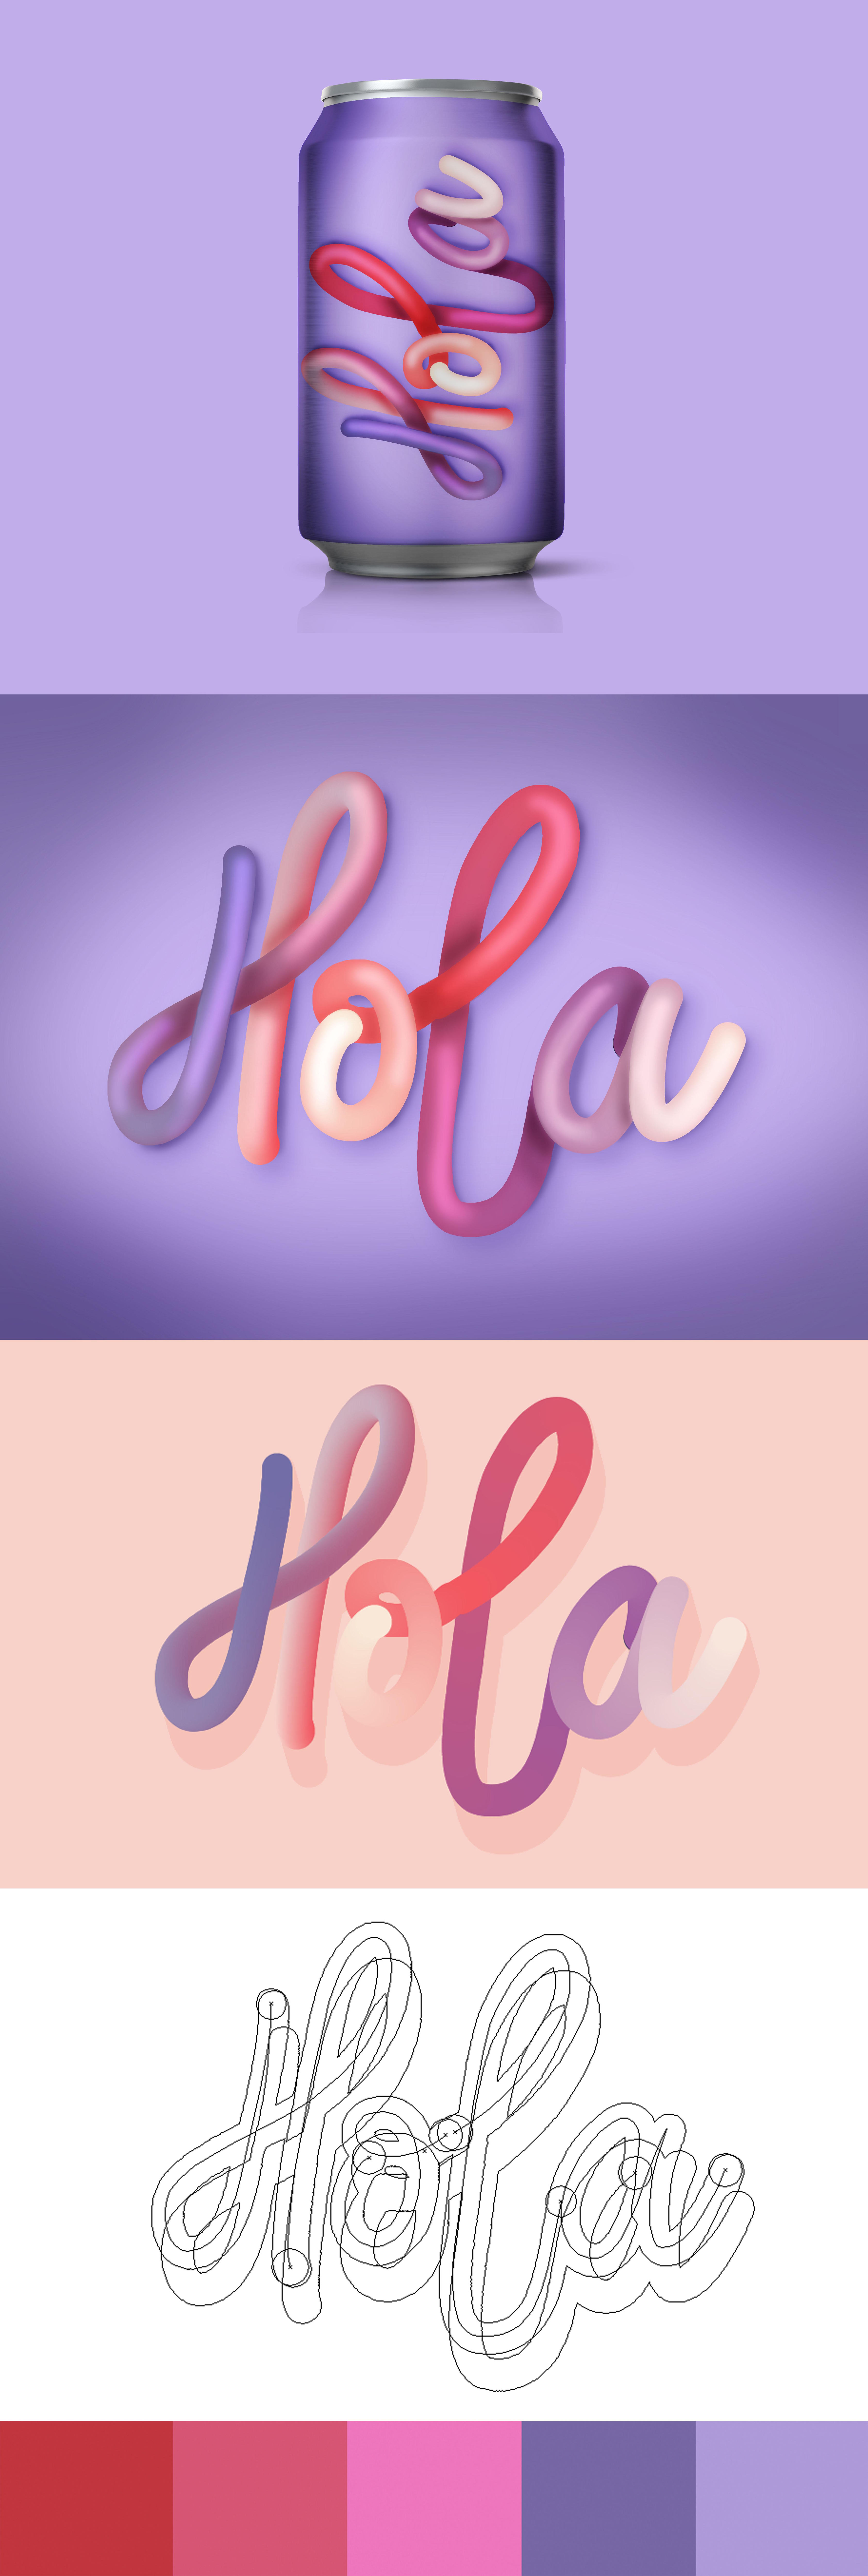 Digital lettering for comercial application